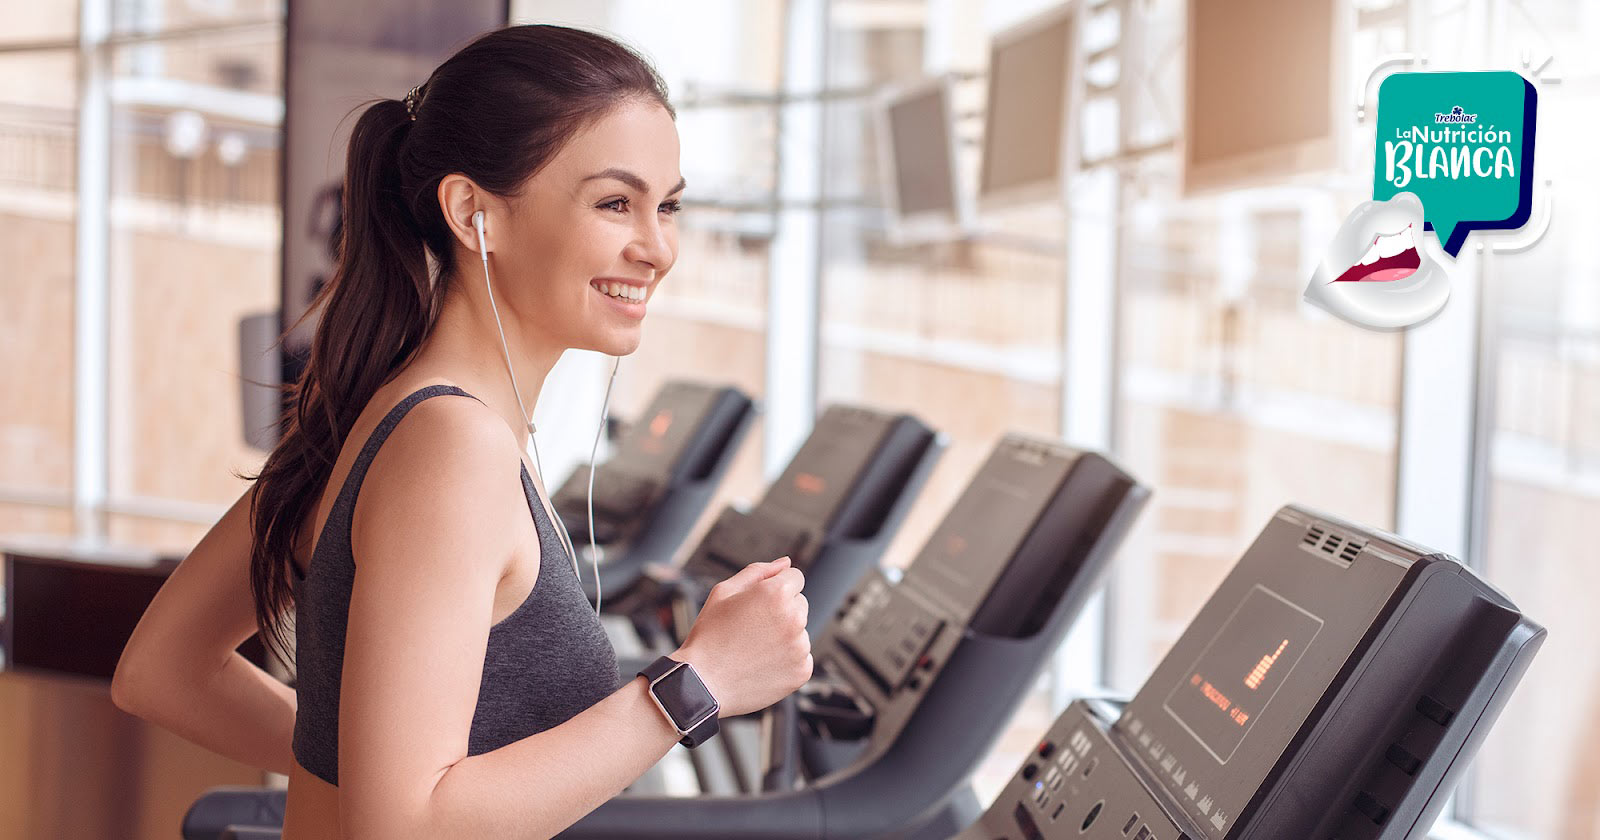 ¿Cómo acelerar tu metabolismo?